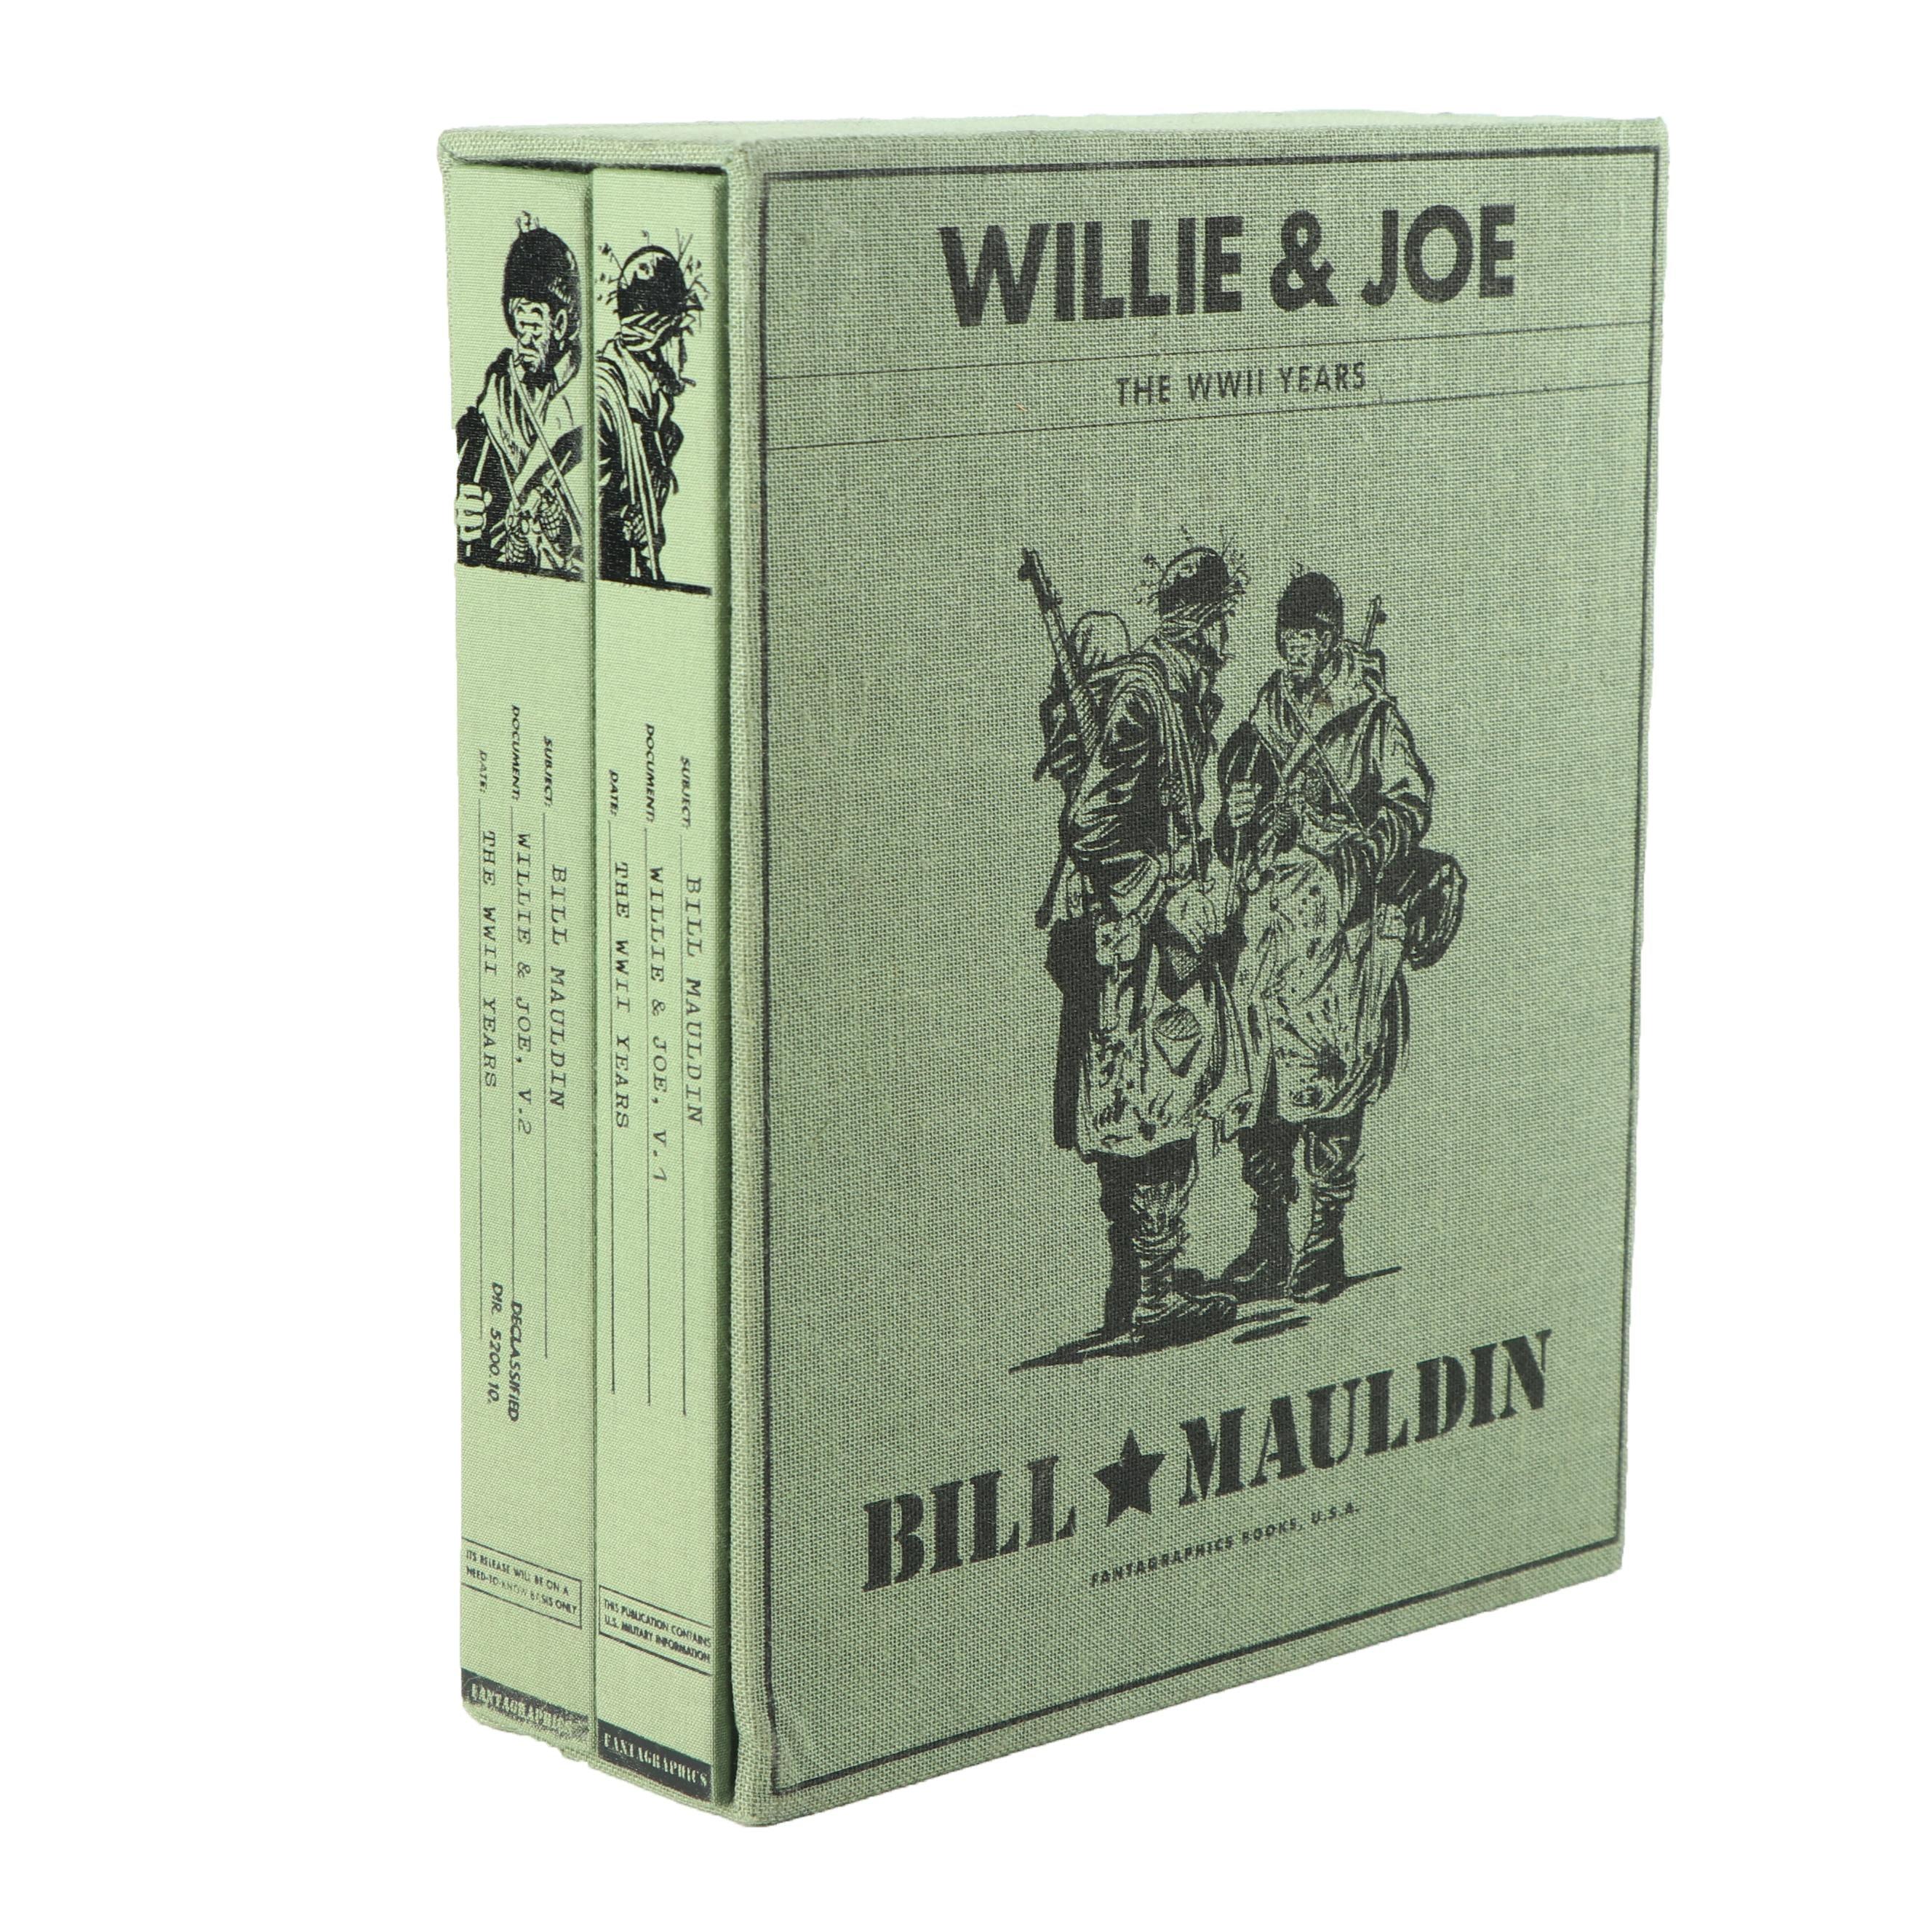 """Willie & Joe: The WWII Years"" Volumes 1 & 2 by Bill Mauldin"